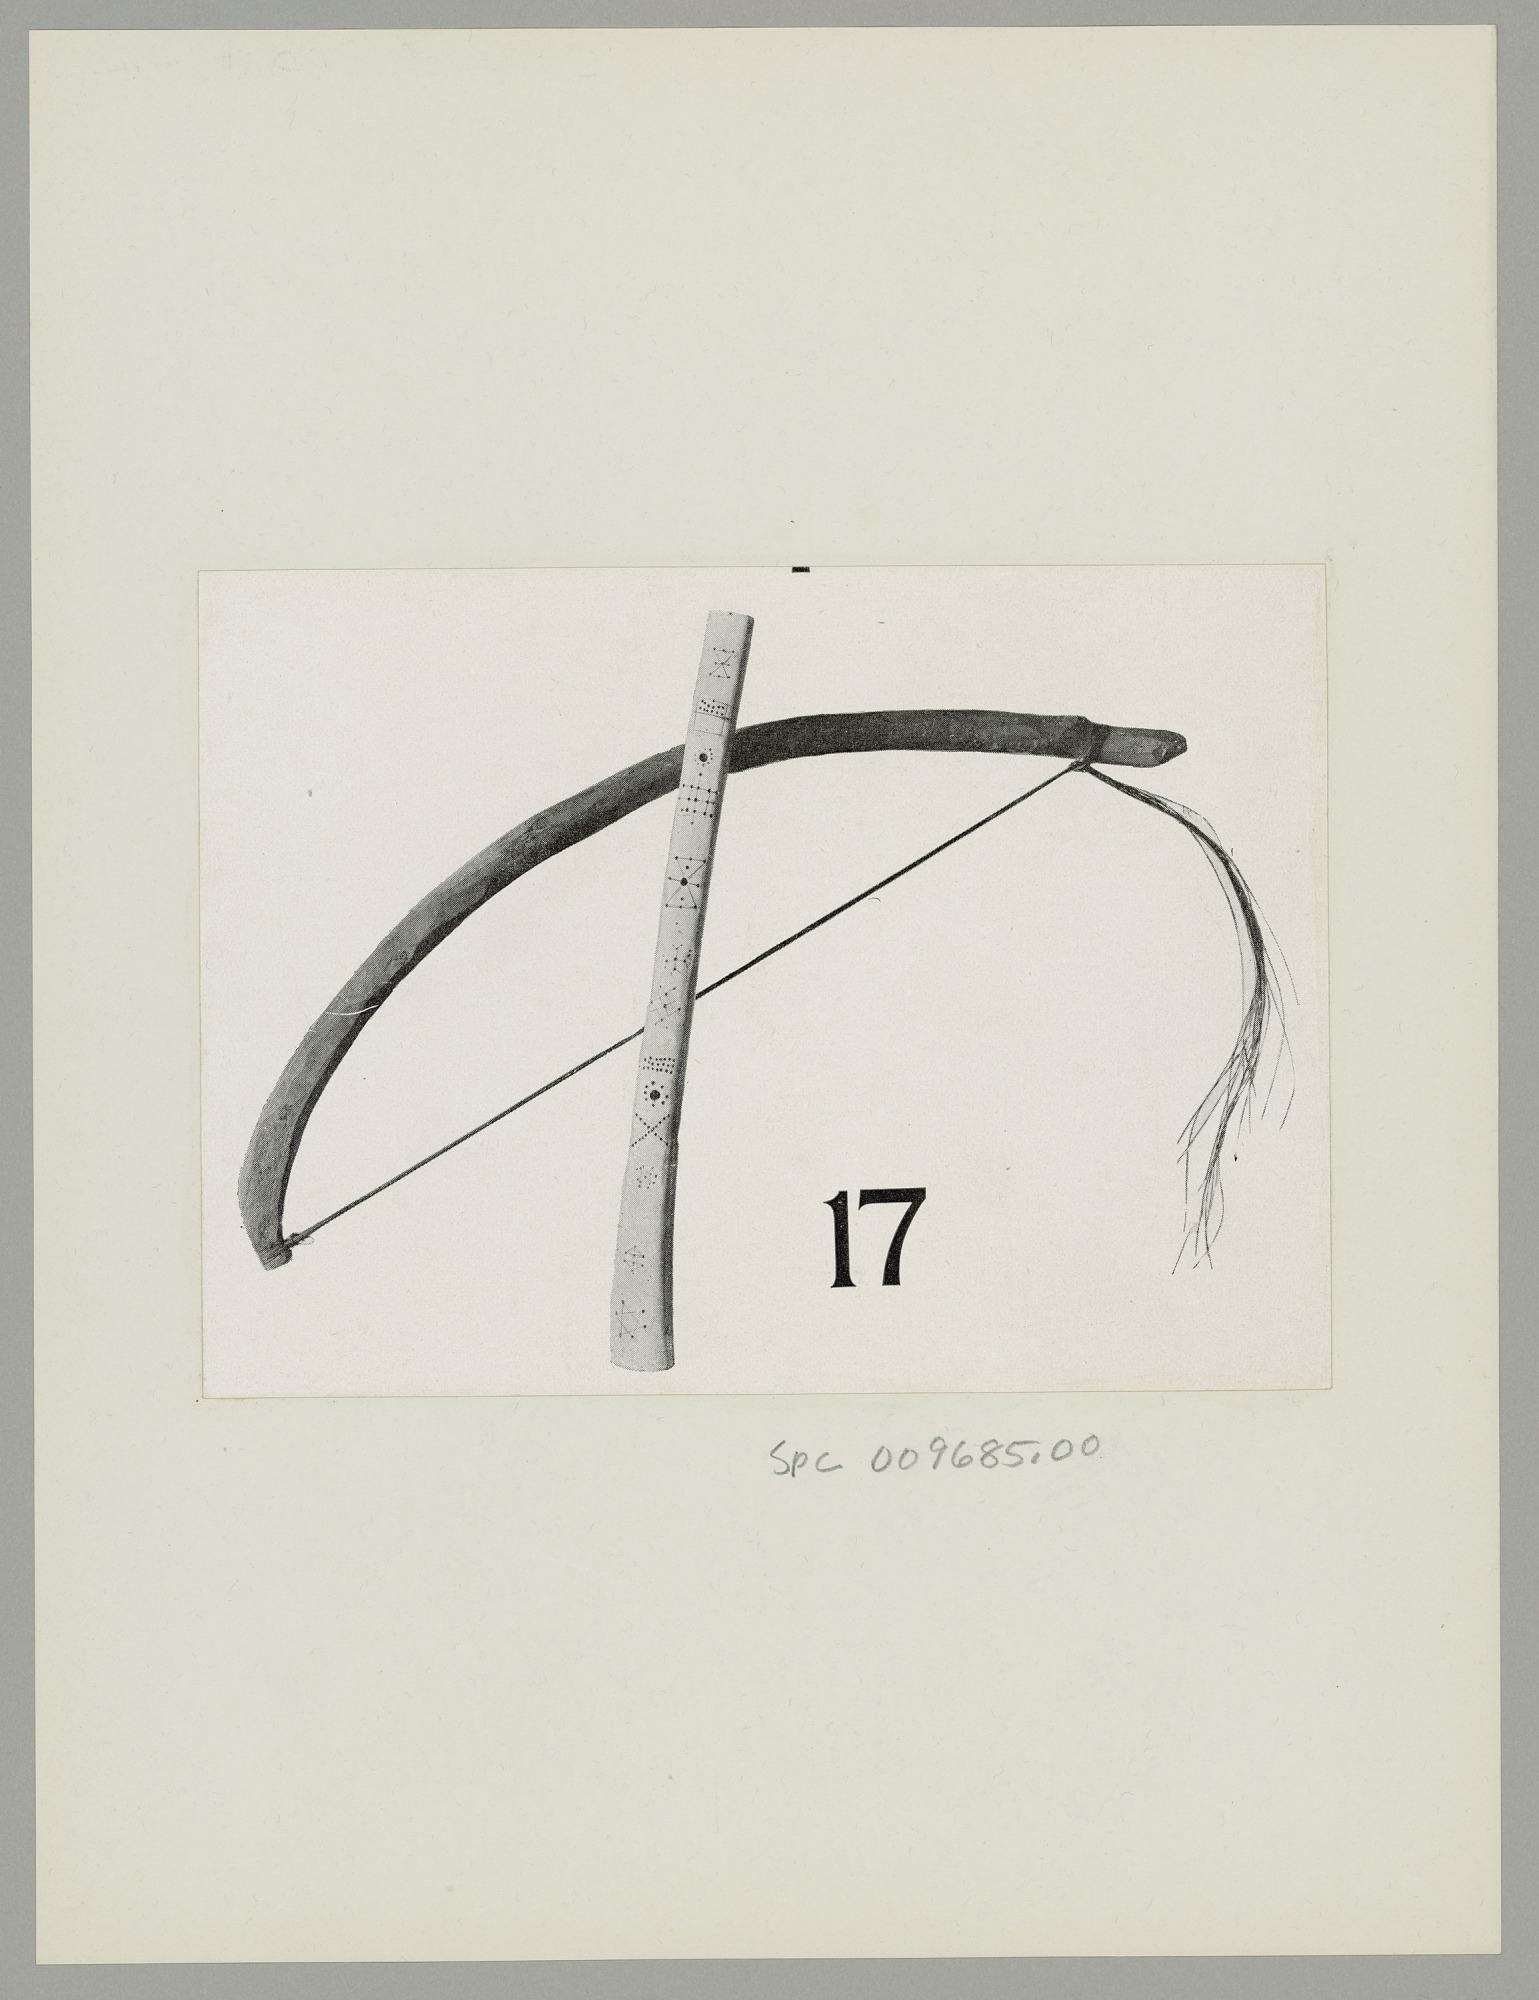 Argentine Bows (Musical Instruments) n.d - Image version 0